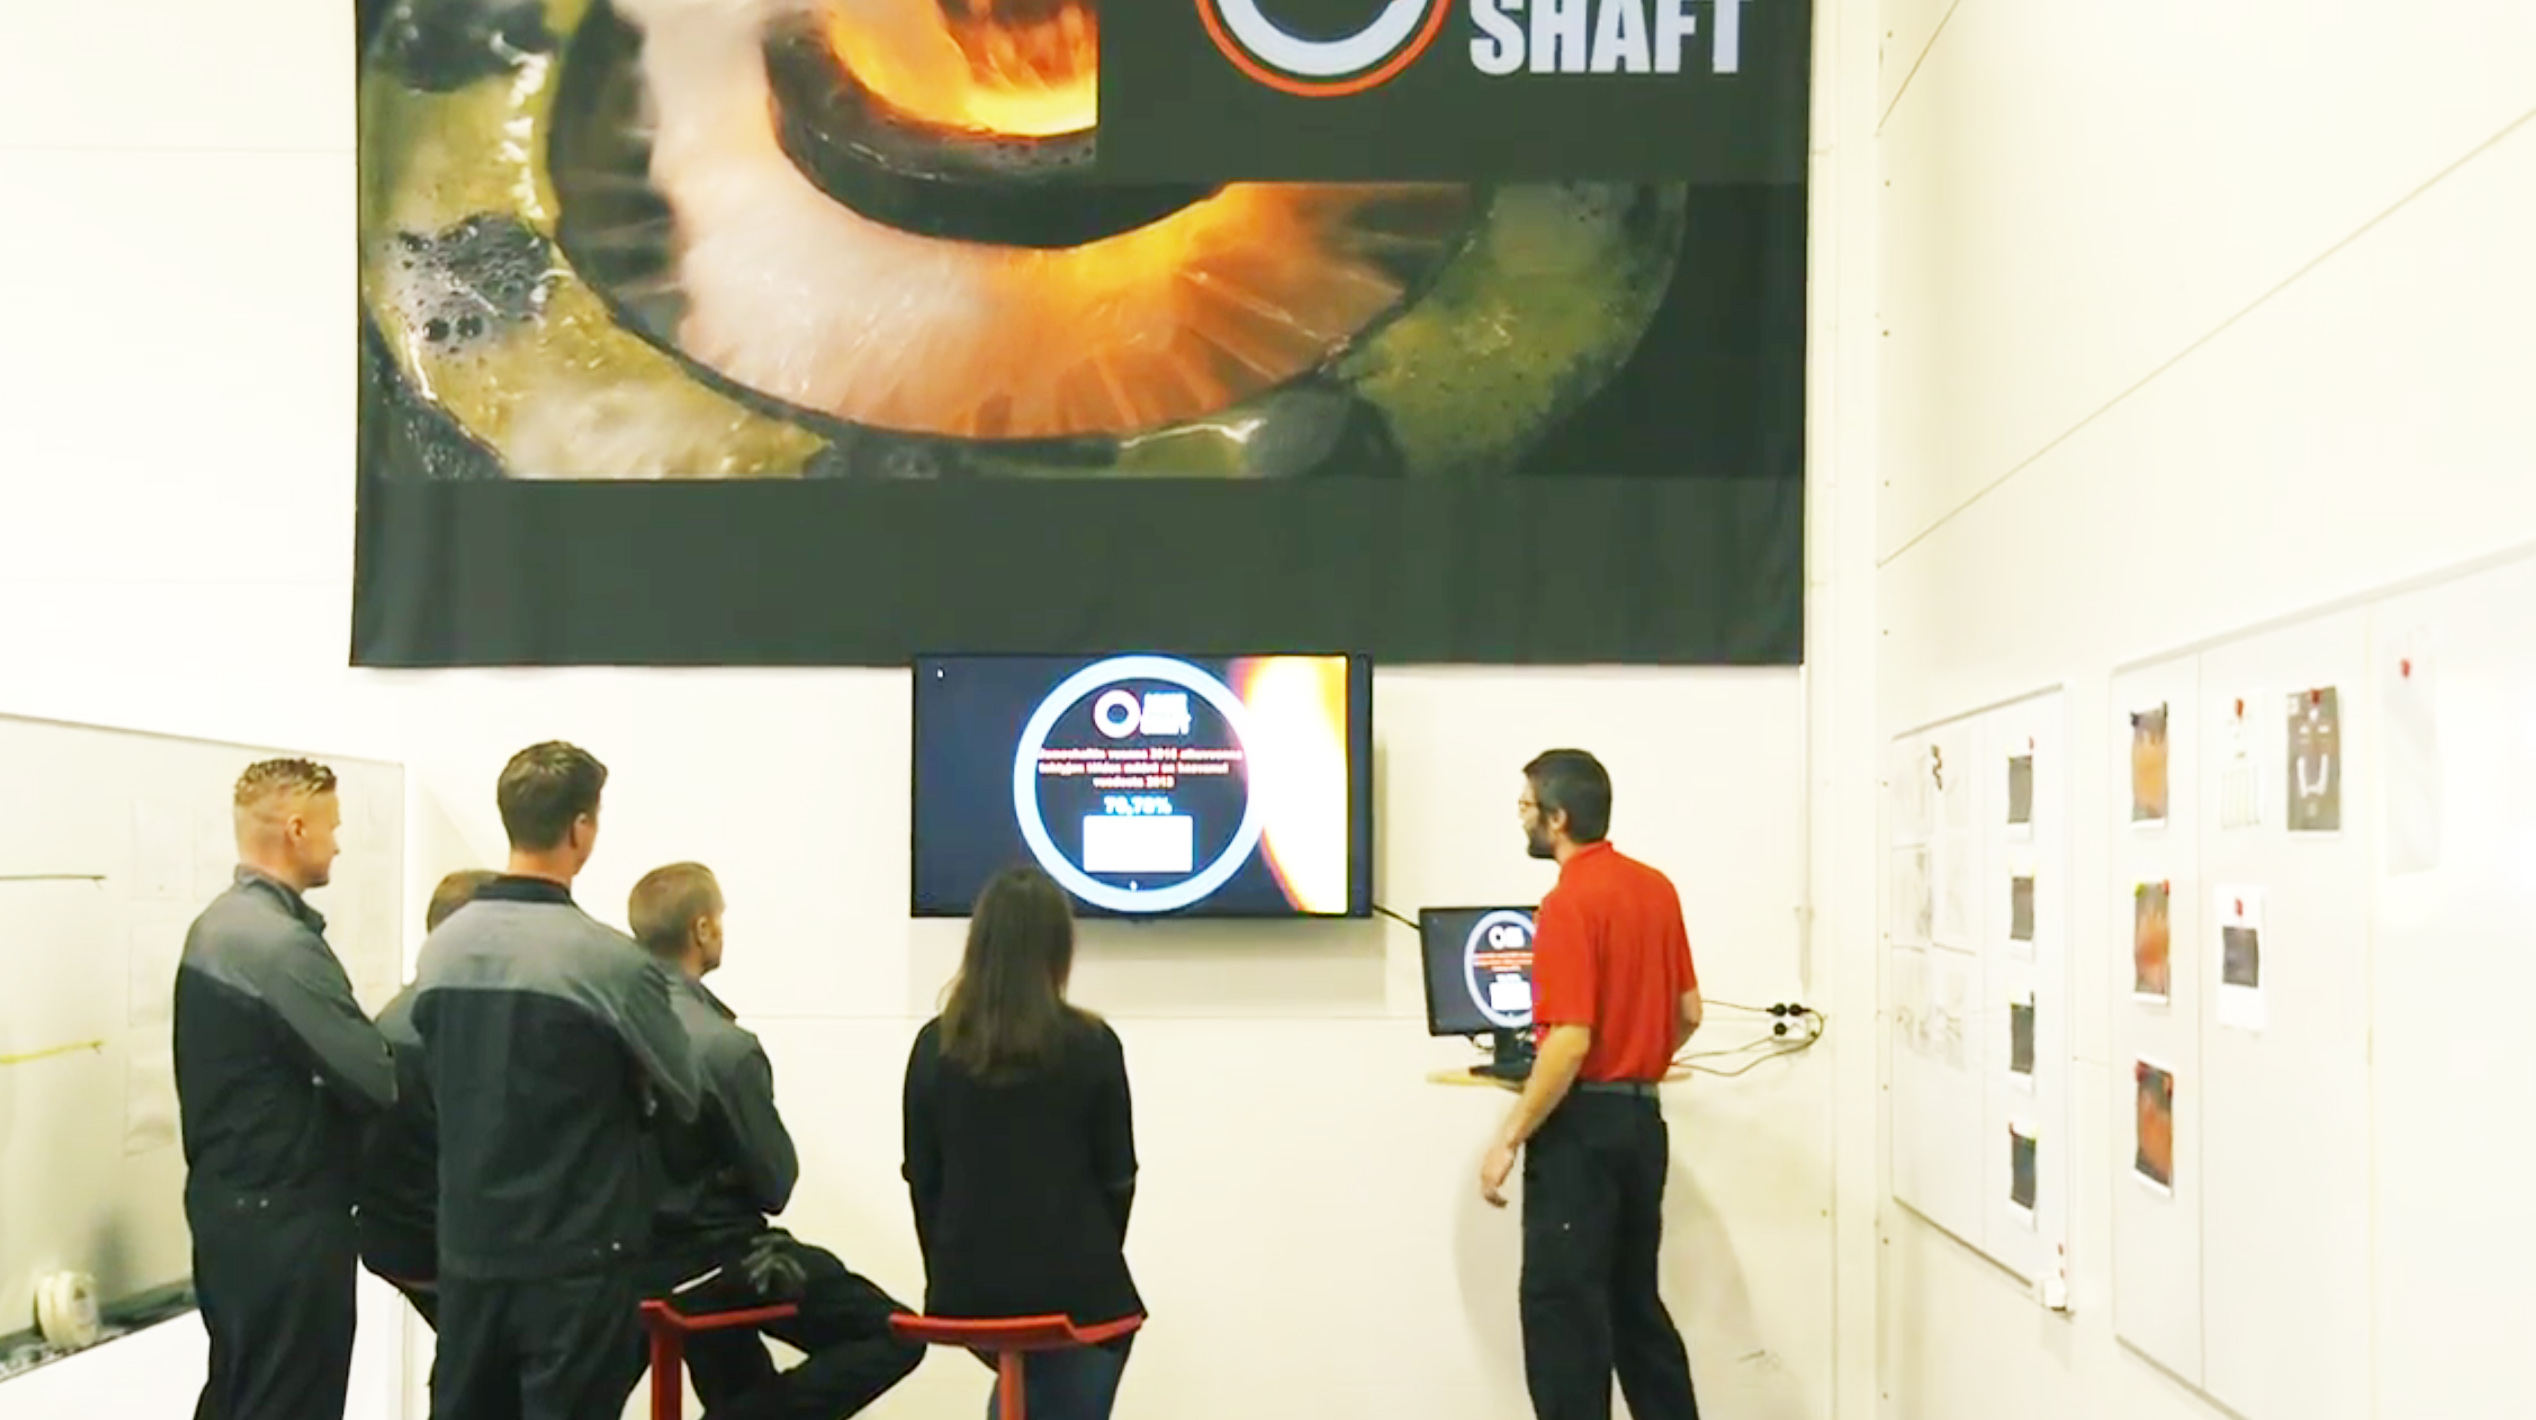 Jame-Shaft-Educating-Employees-Automation-Lean-5S-Robotics